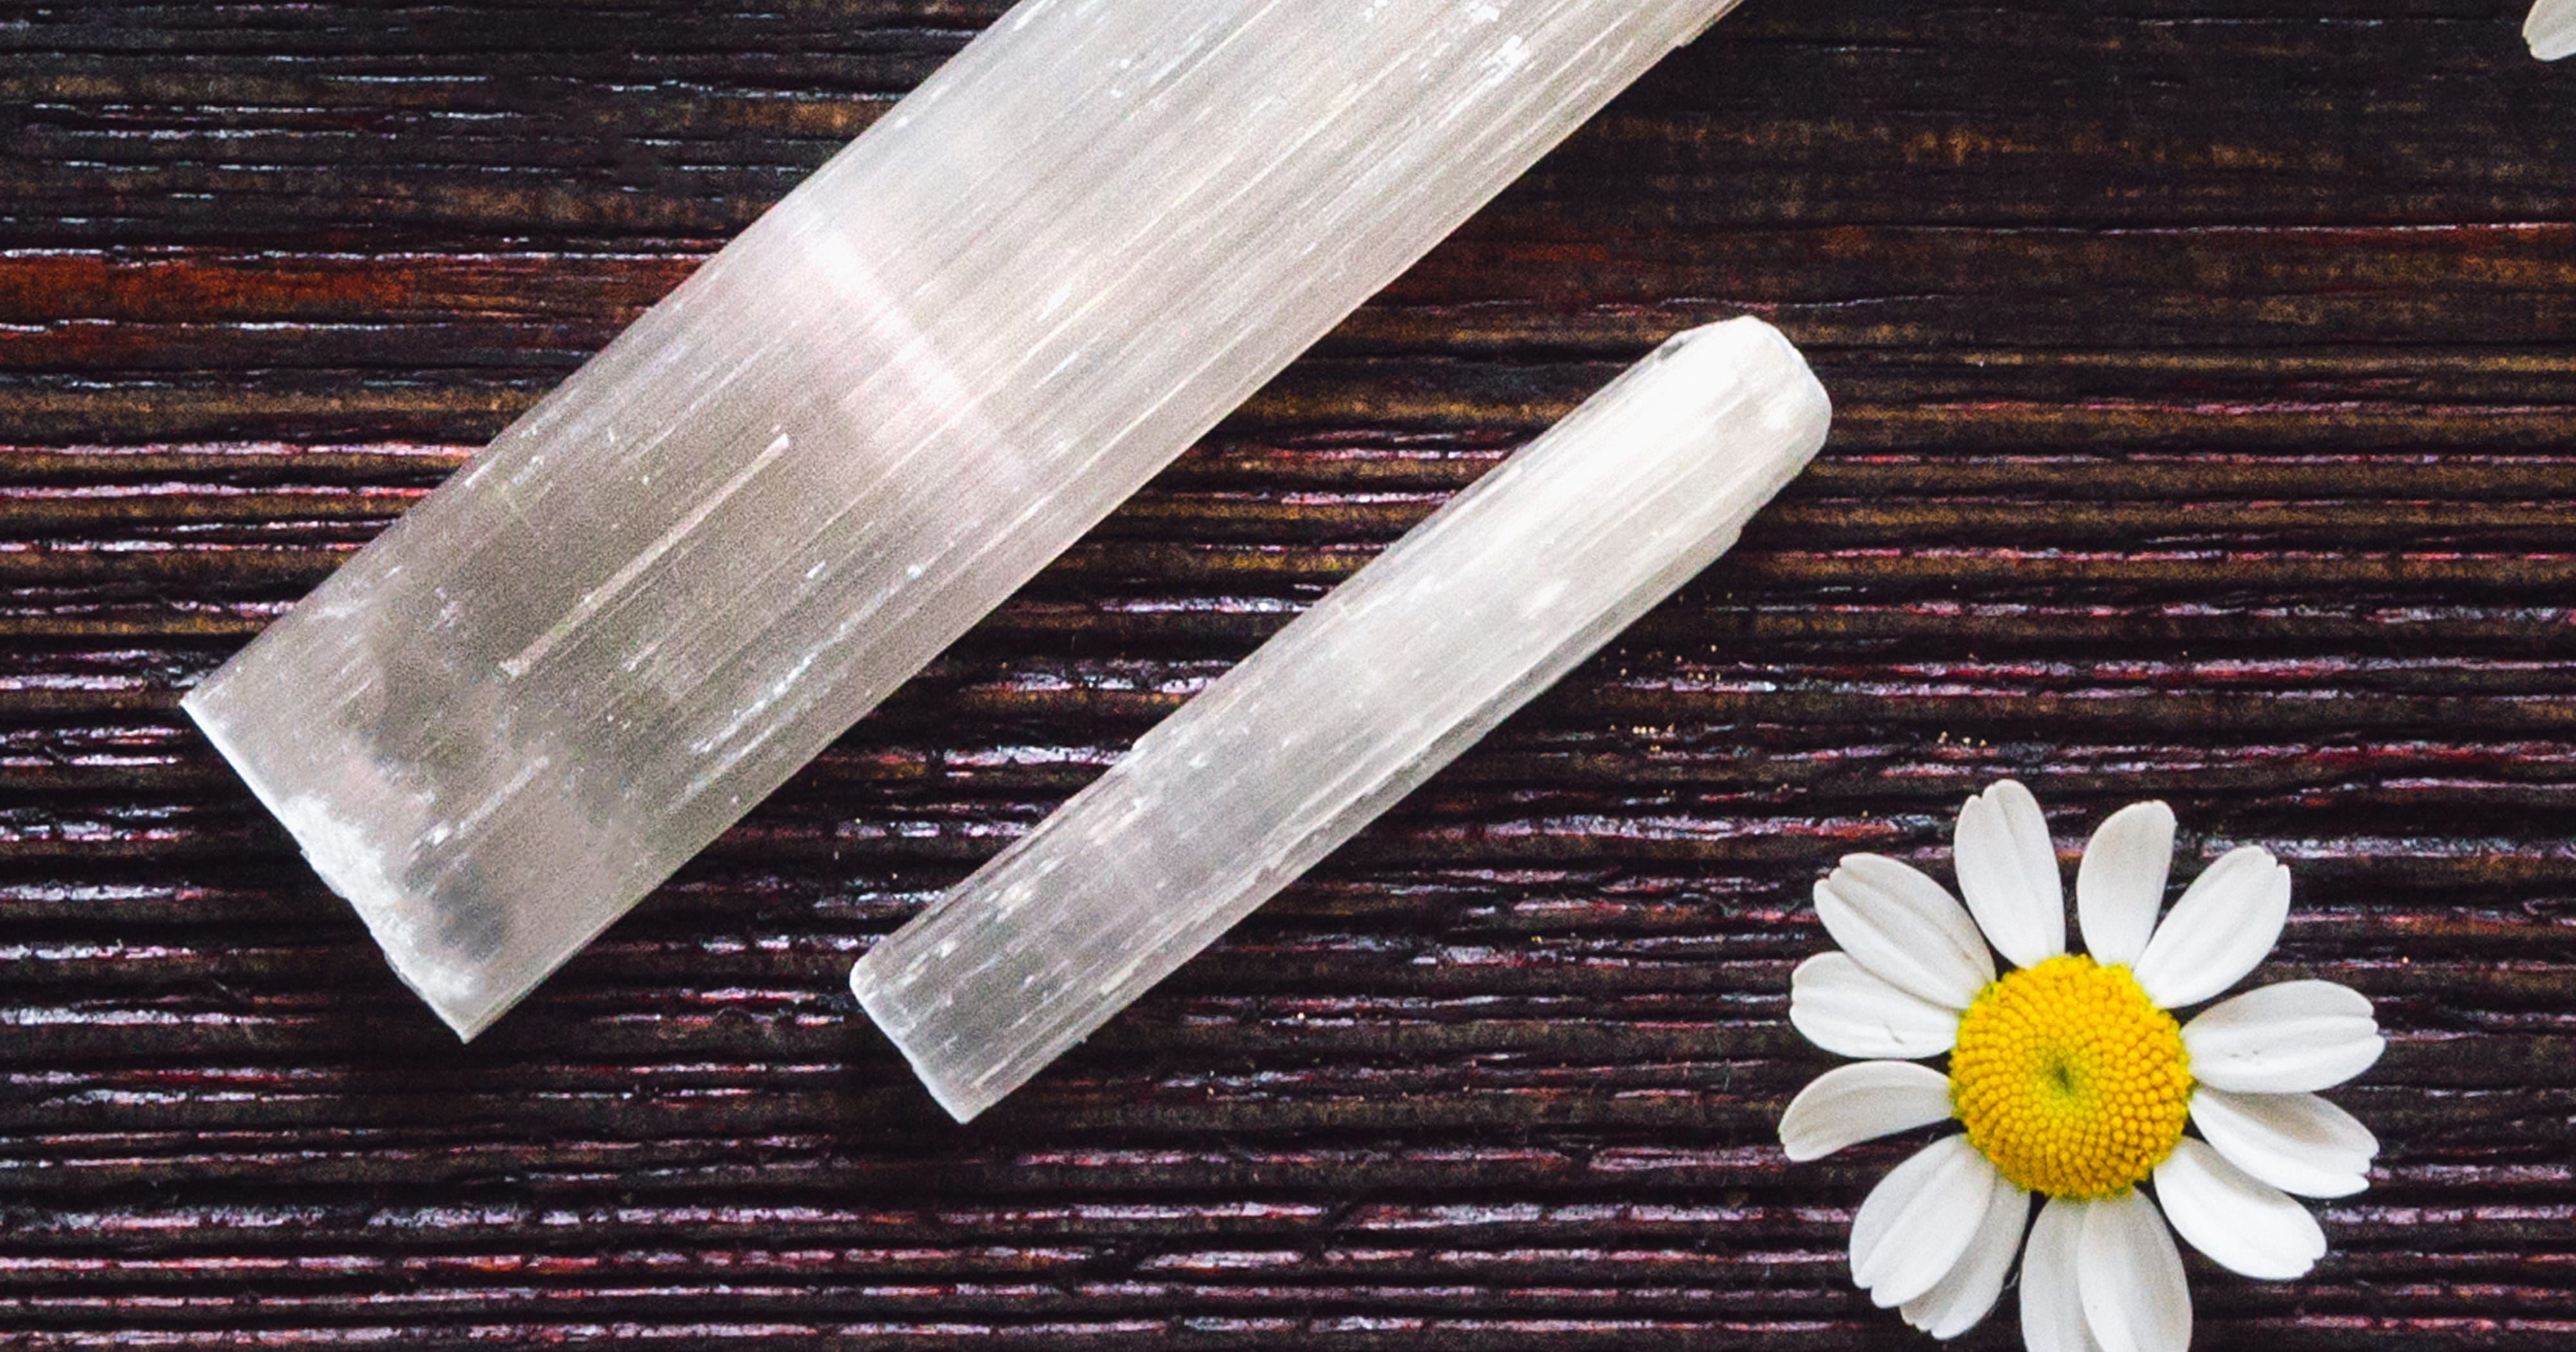 Selenite Crystal Wands - Uses And Healing Properties